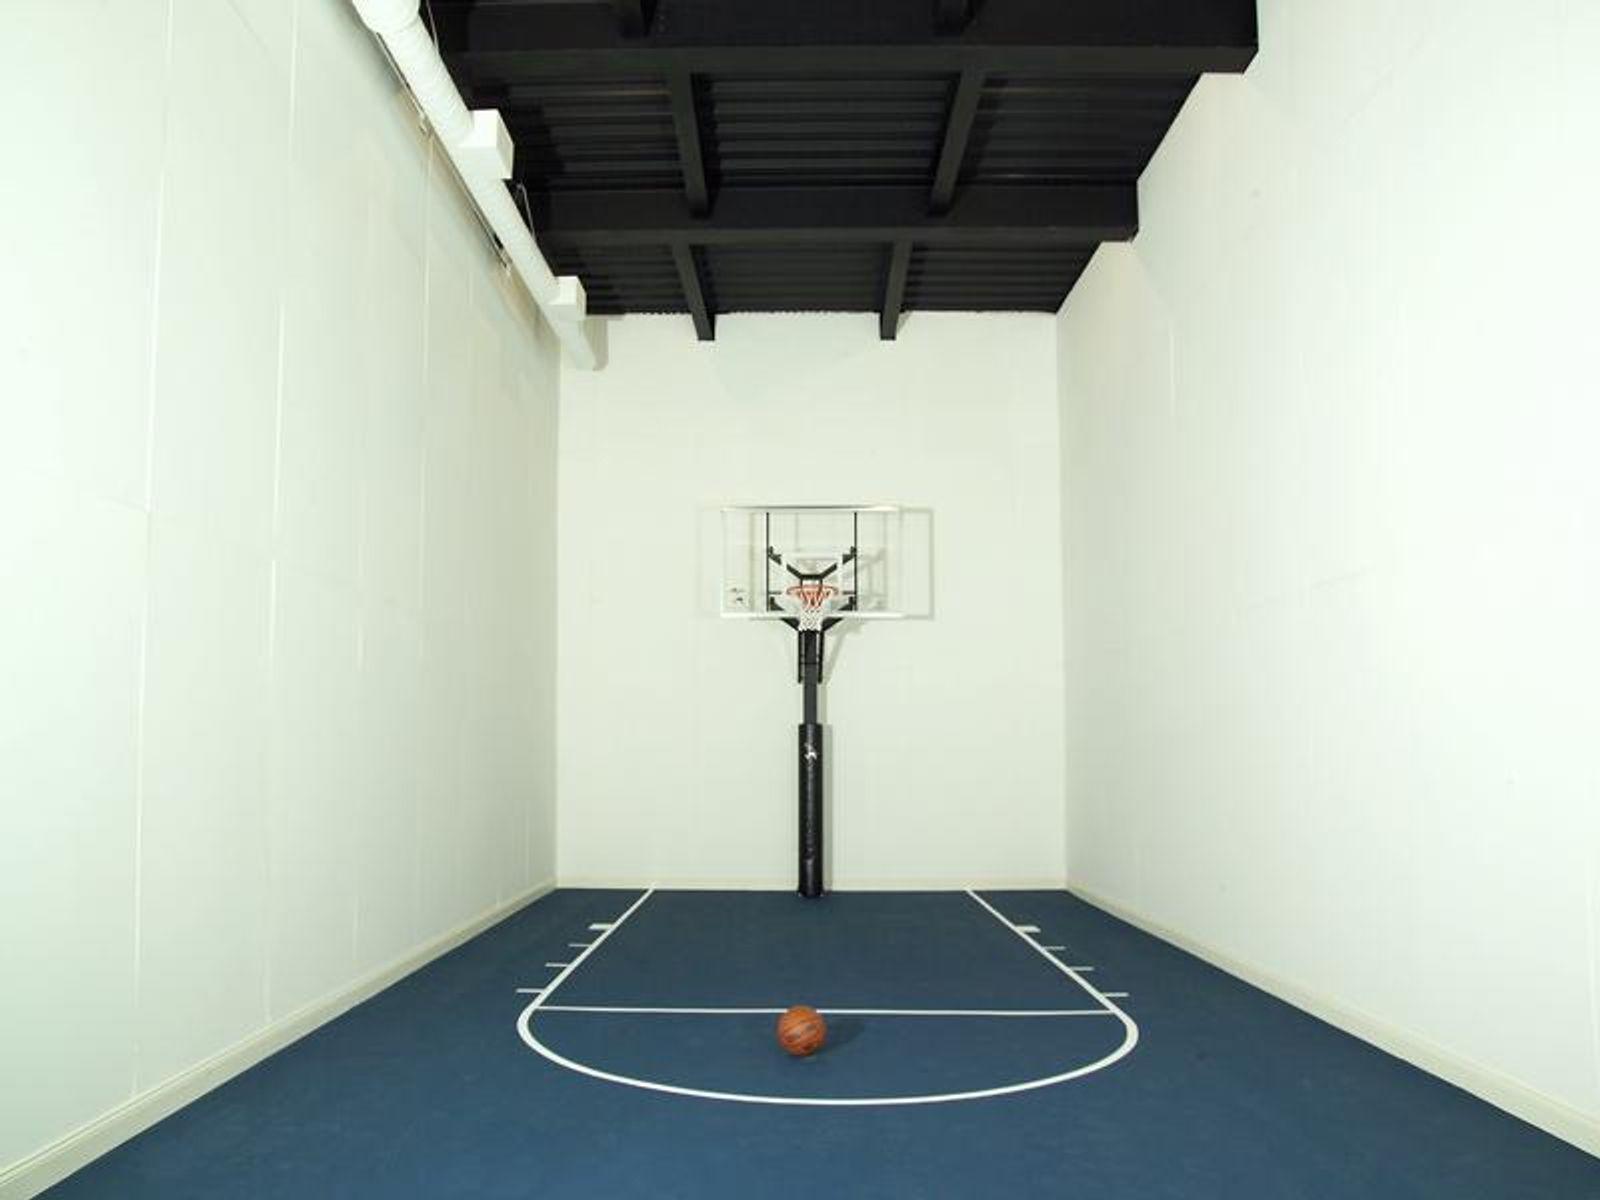 Squash/Basketball Court